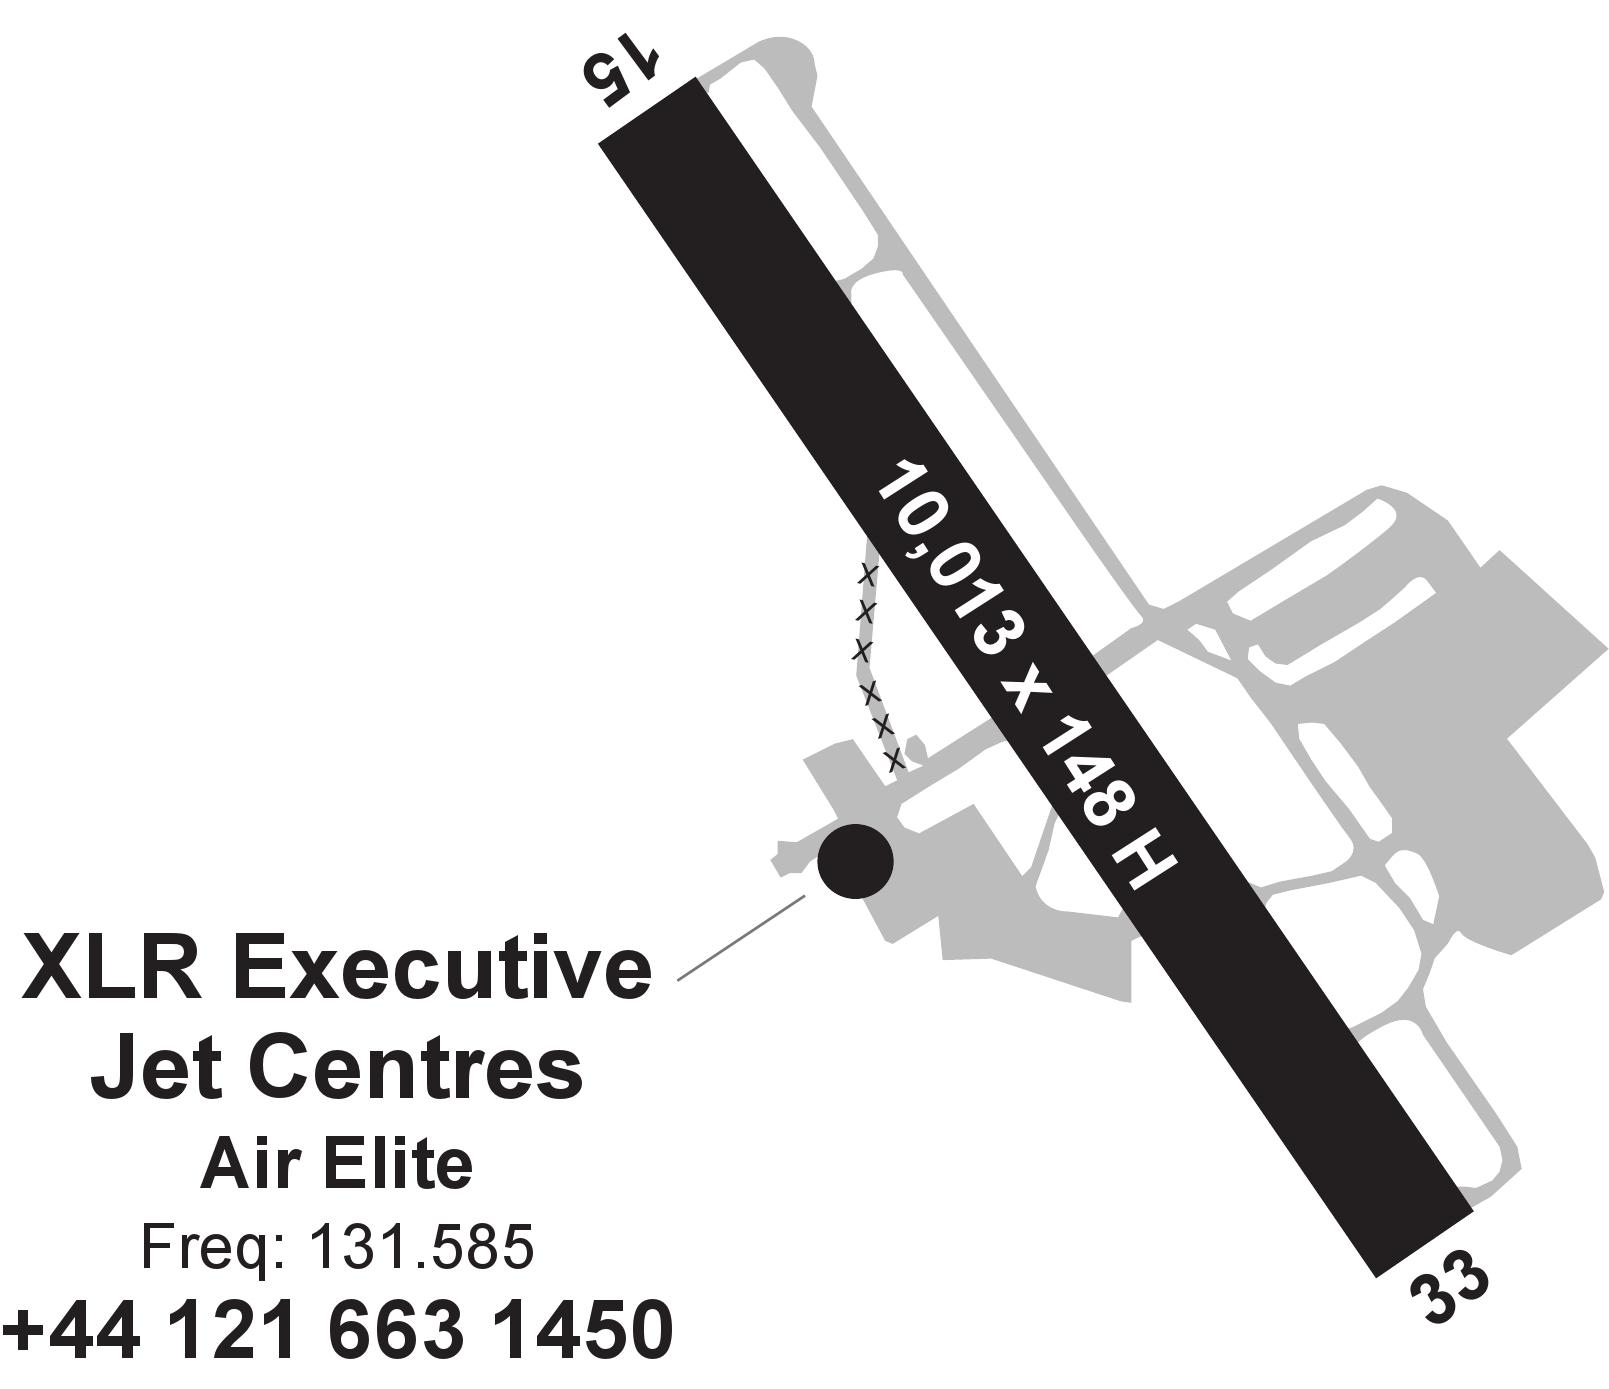 Xlr Executive Jet Centres